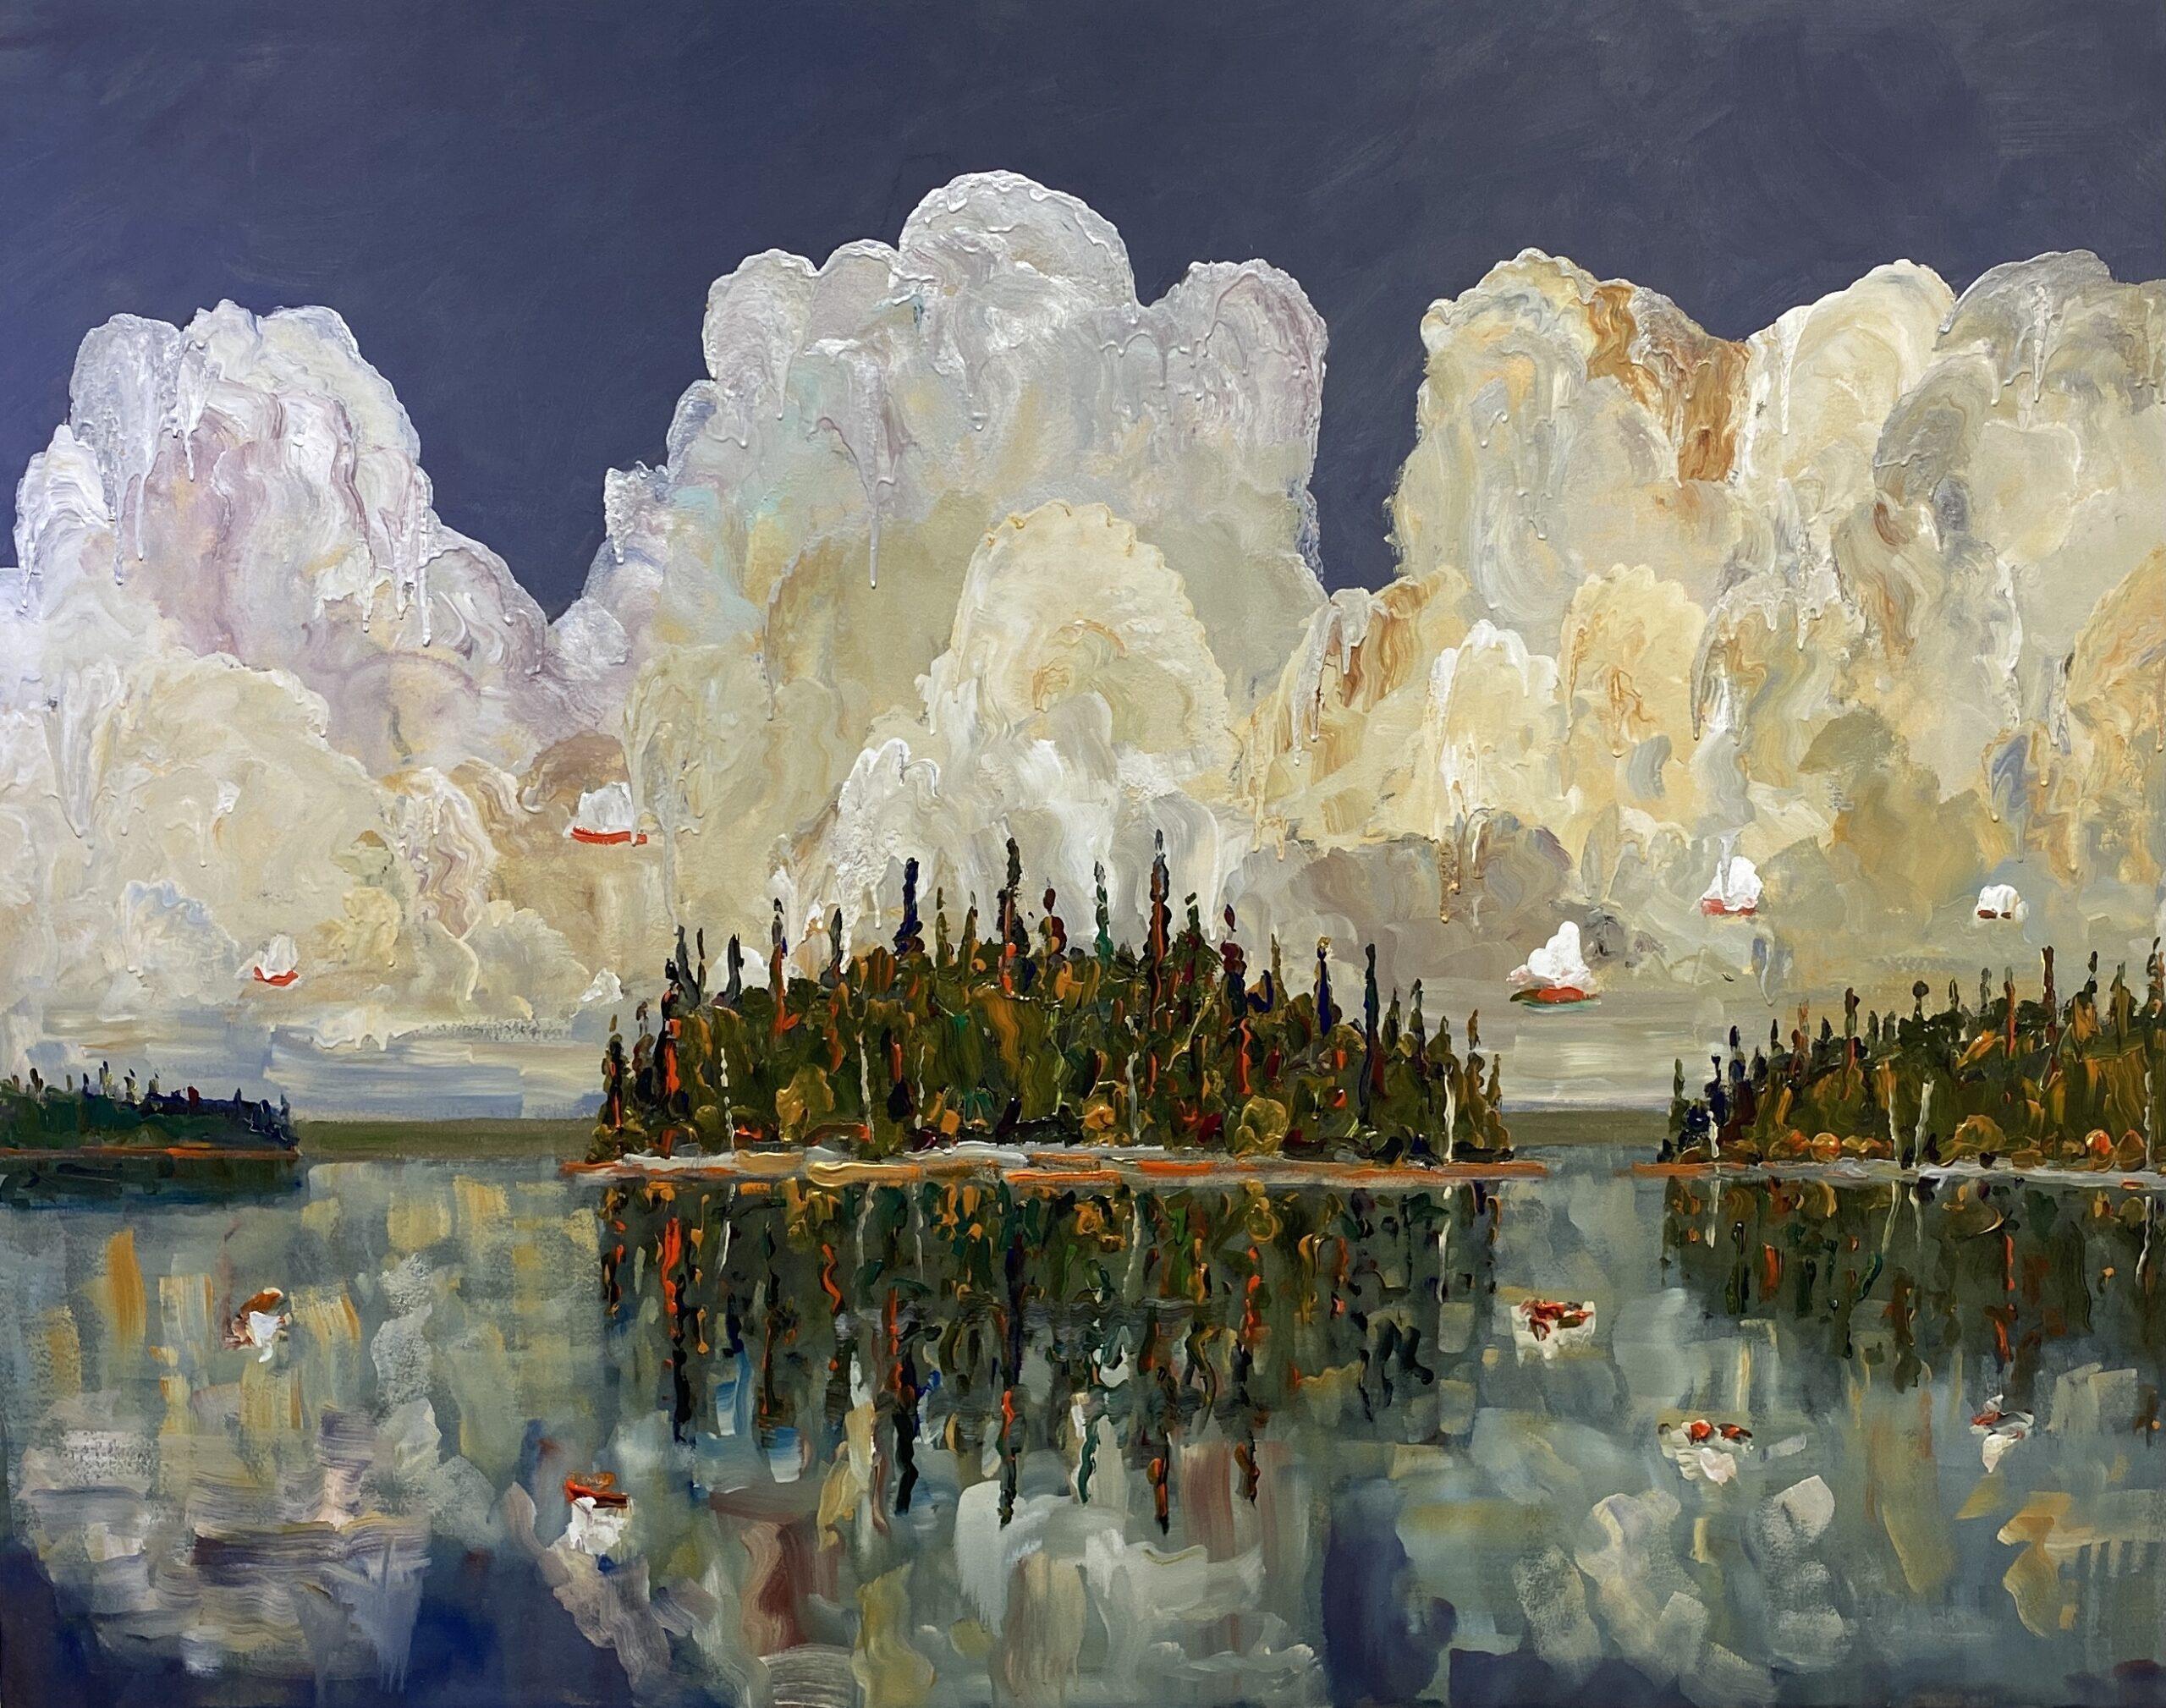 Meditation 2021 acrylic on canvas 56 1:2 x 76